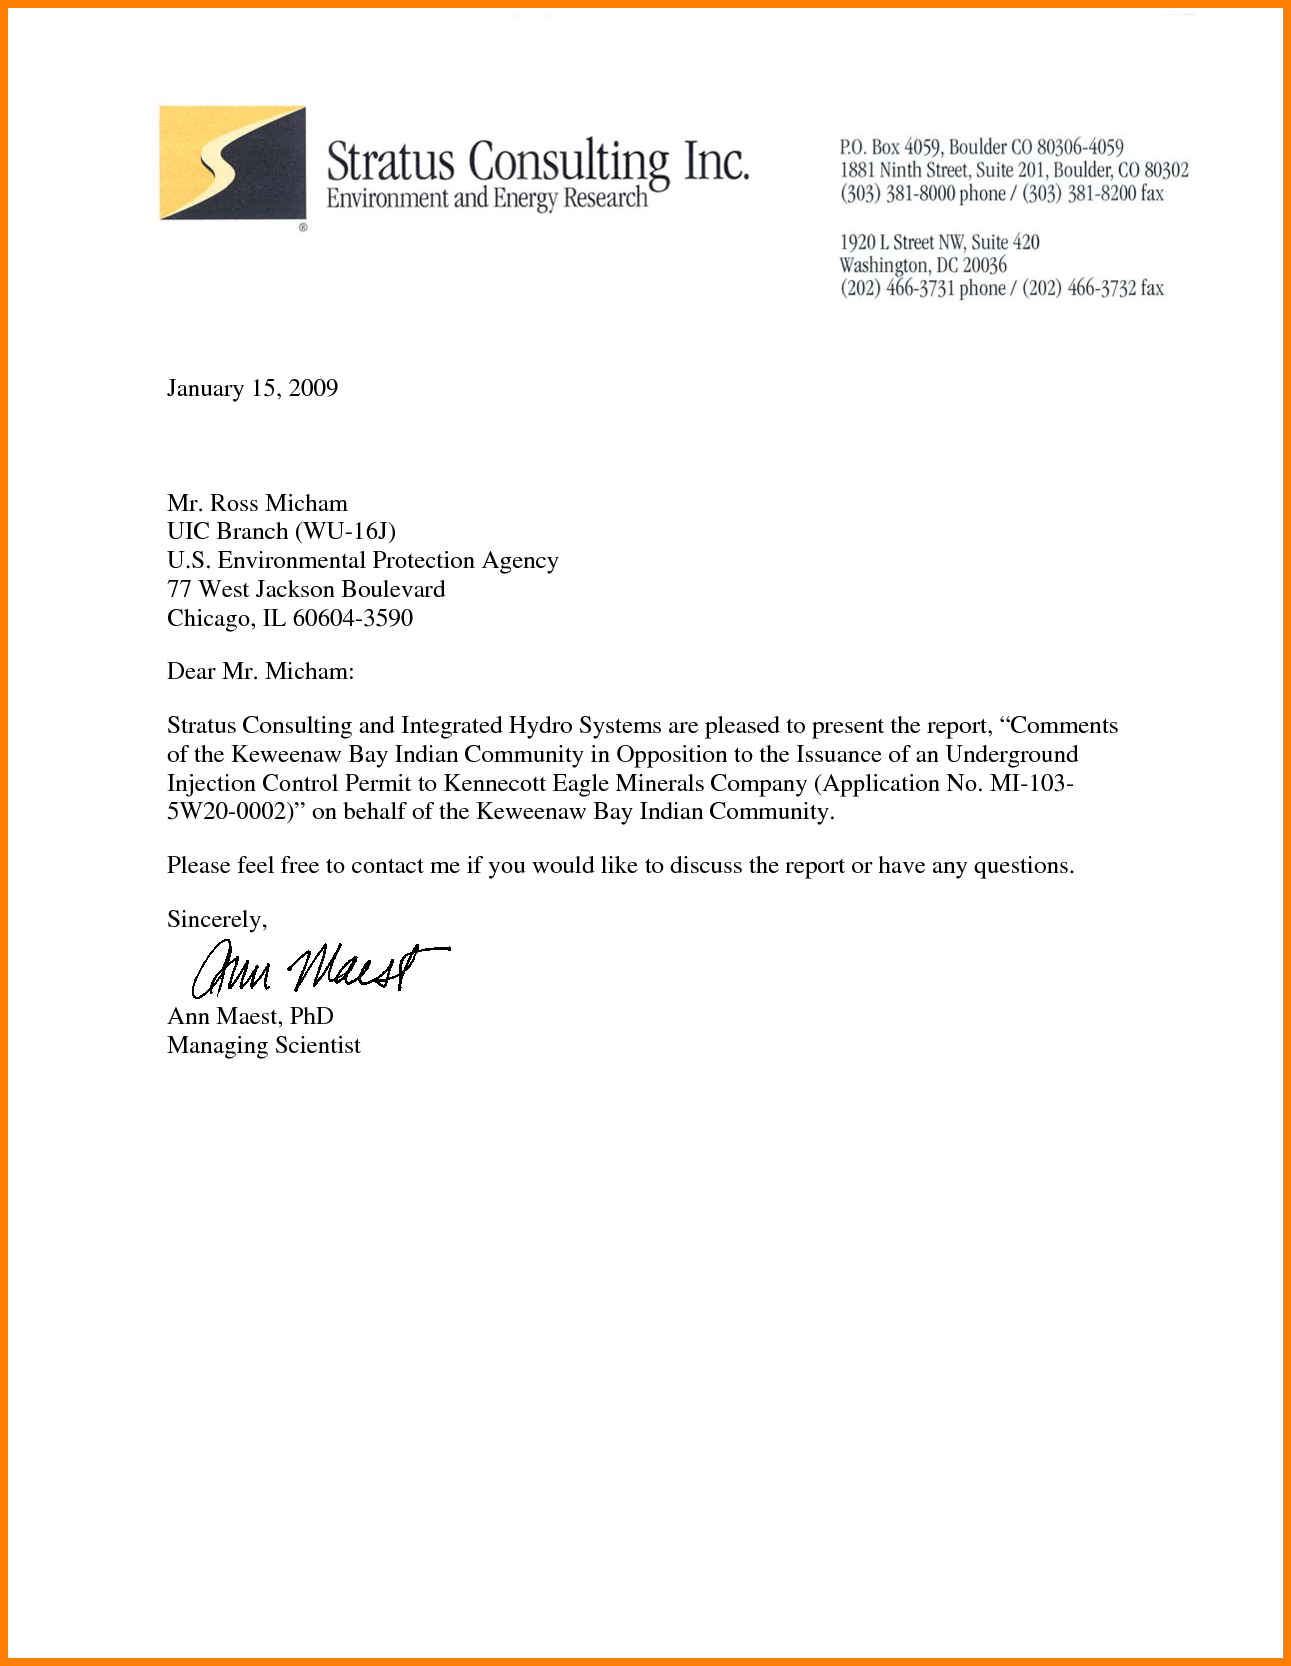 Business Letterhead Format Free Printable Letterhead